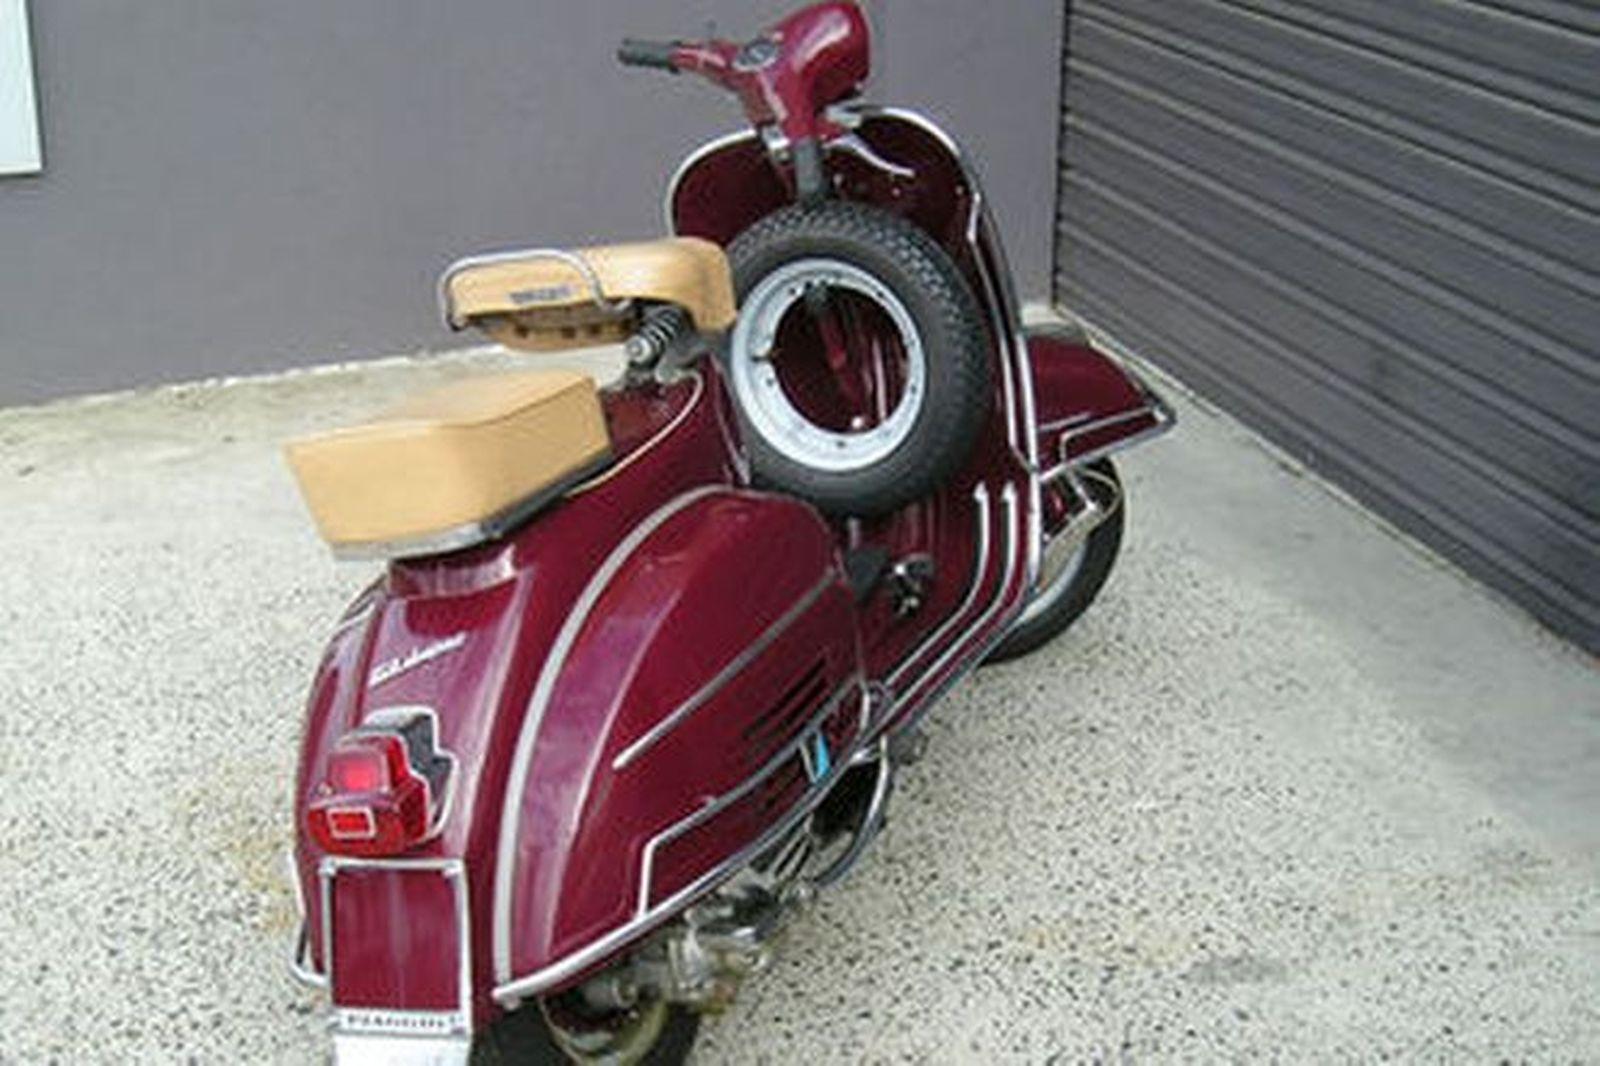 Sold  Vespa Super 150 Scooter Auctions - Lot 9